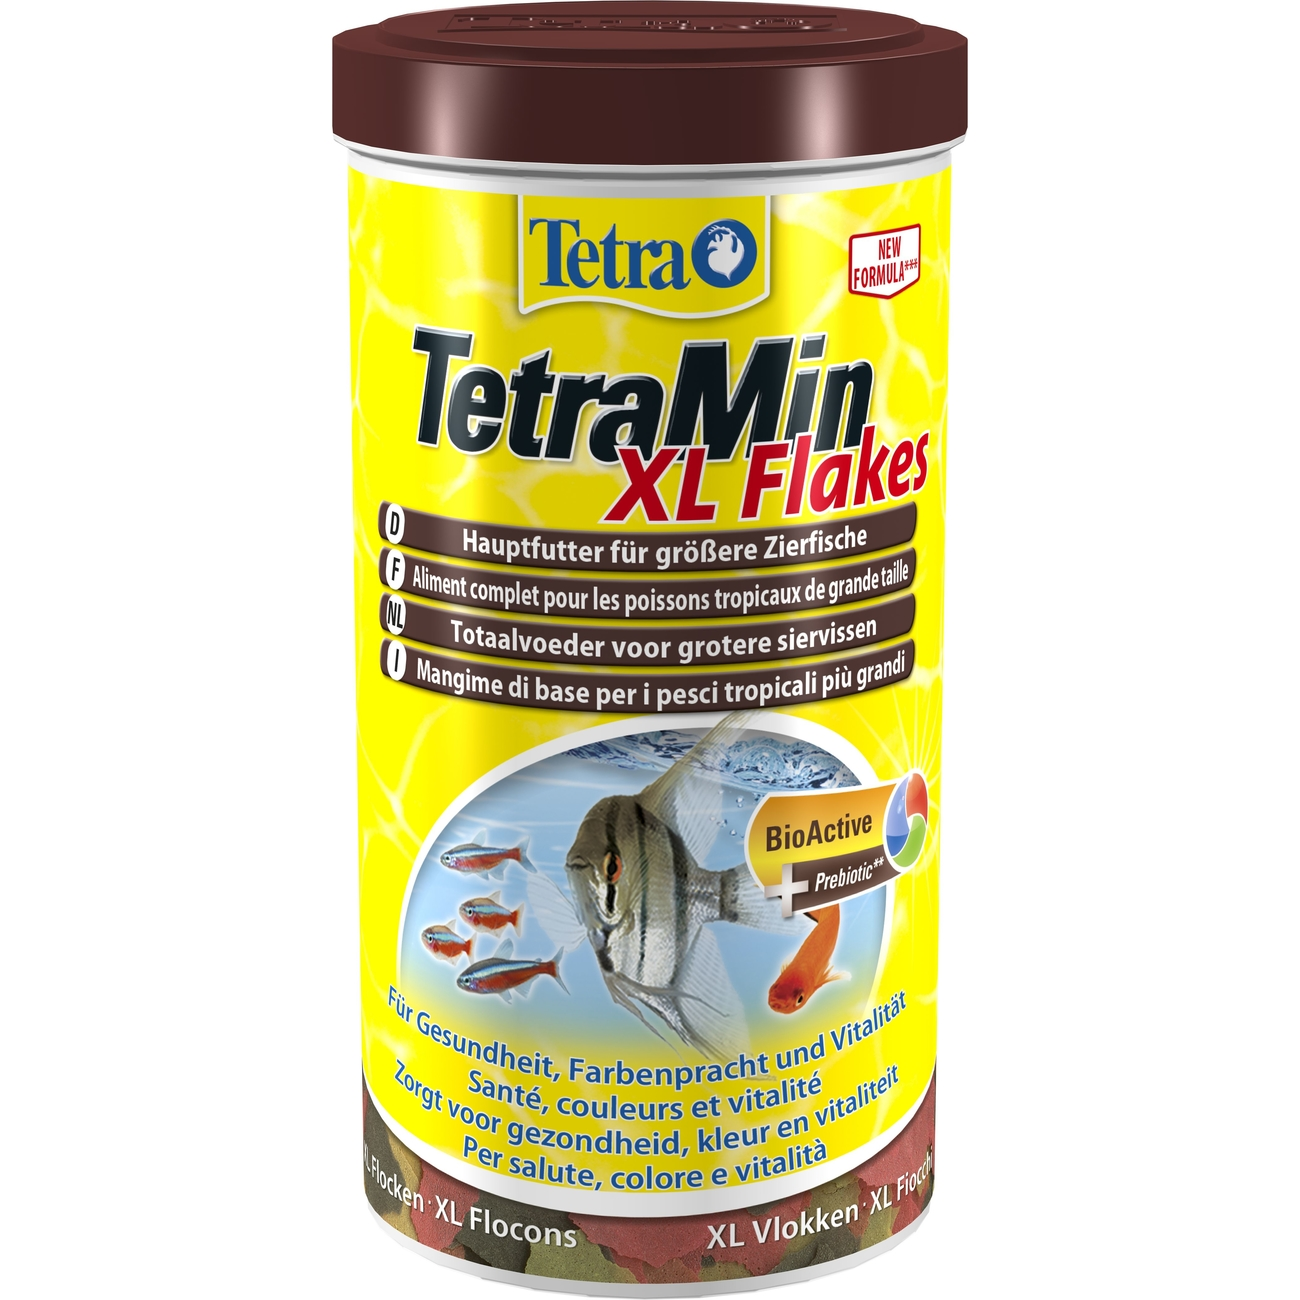 TetraMin XL Flakes Preview Image